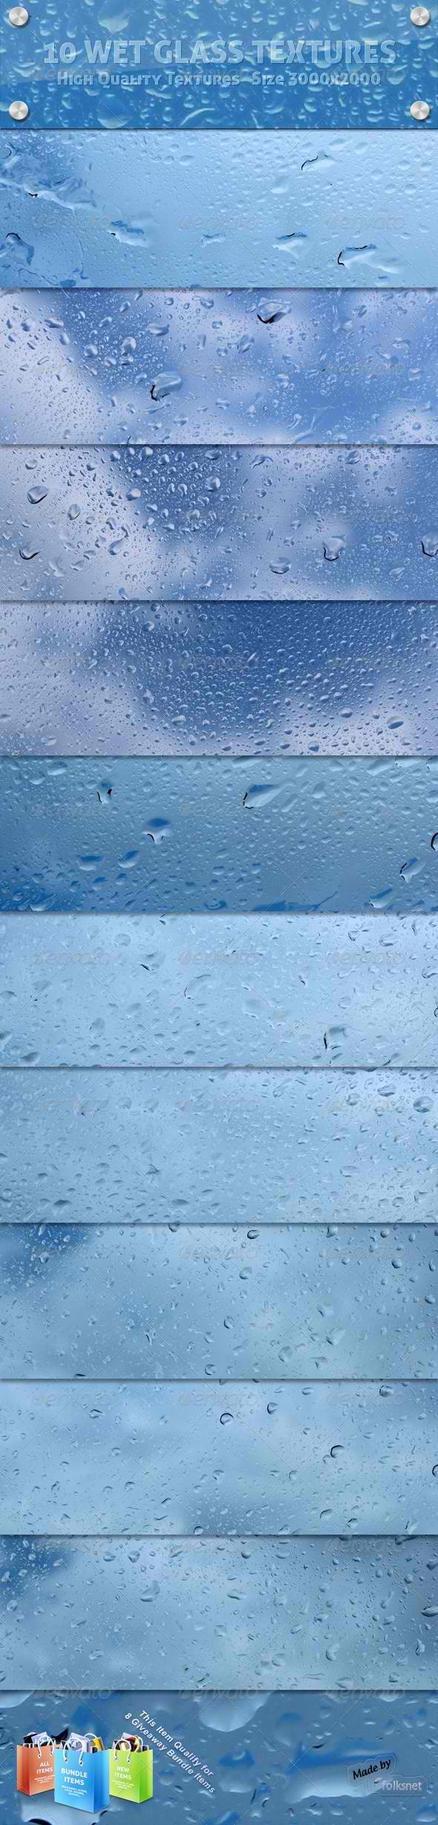 Wet Glass Textures by GrDezign